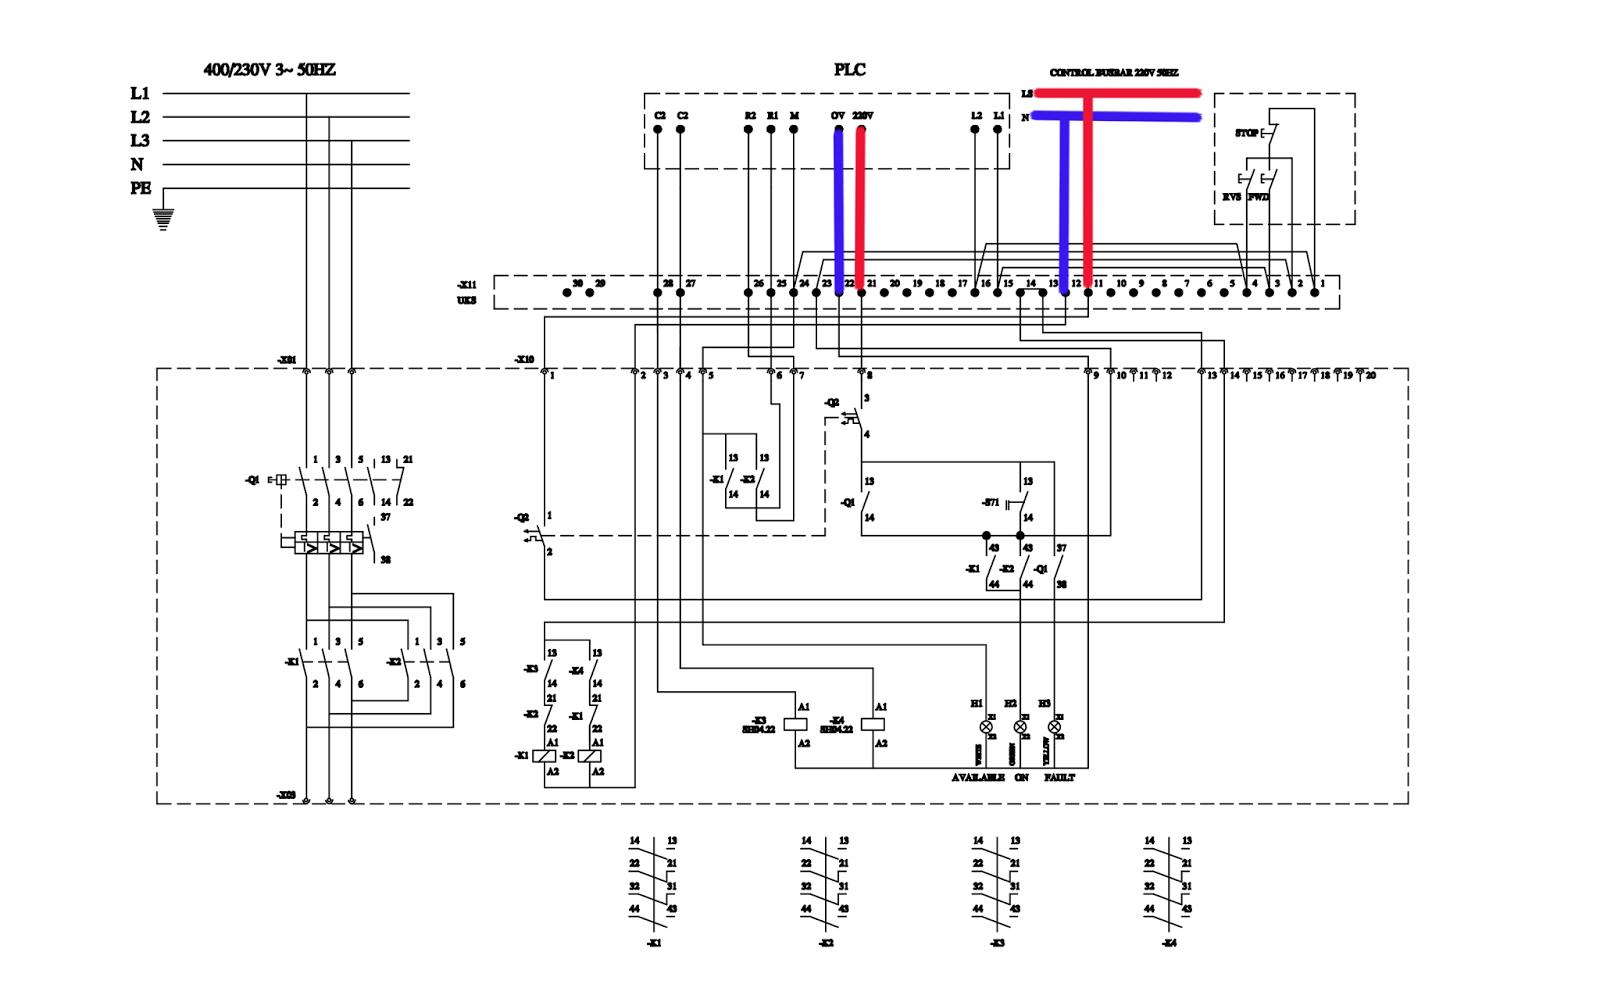 wiring diagram plc zelio